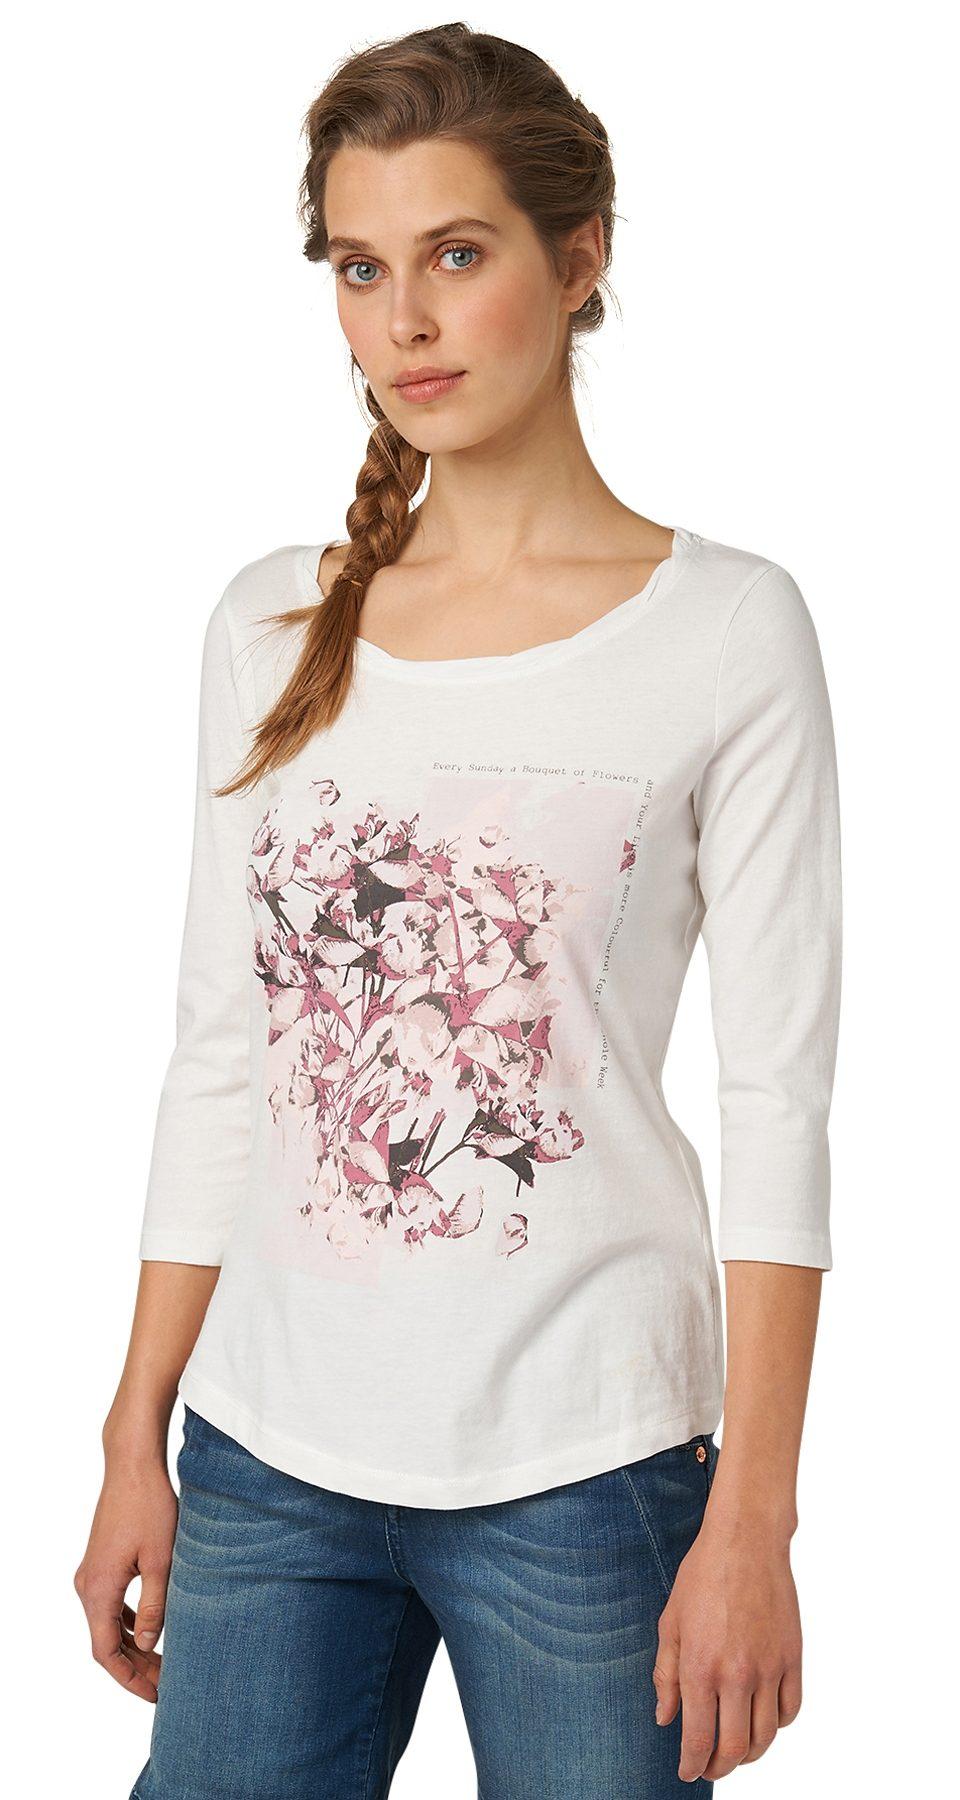 TOM TAILOR T-Shirt »Shirt mit Blüten-Print«